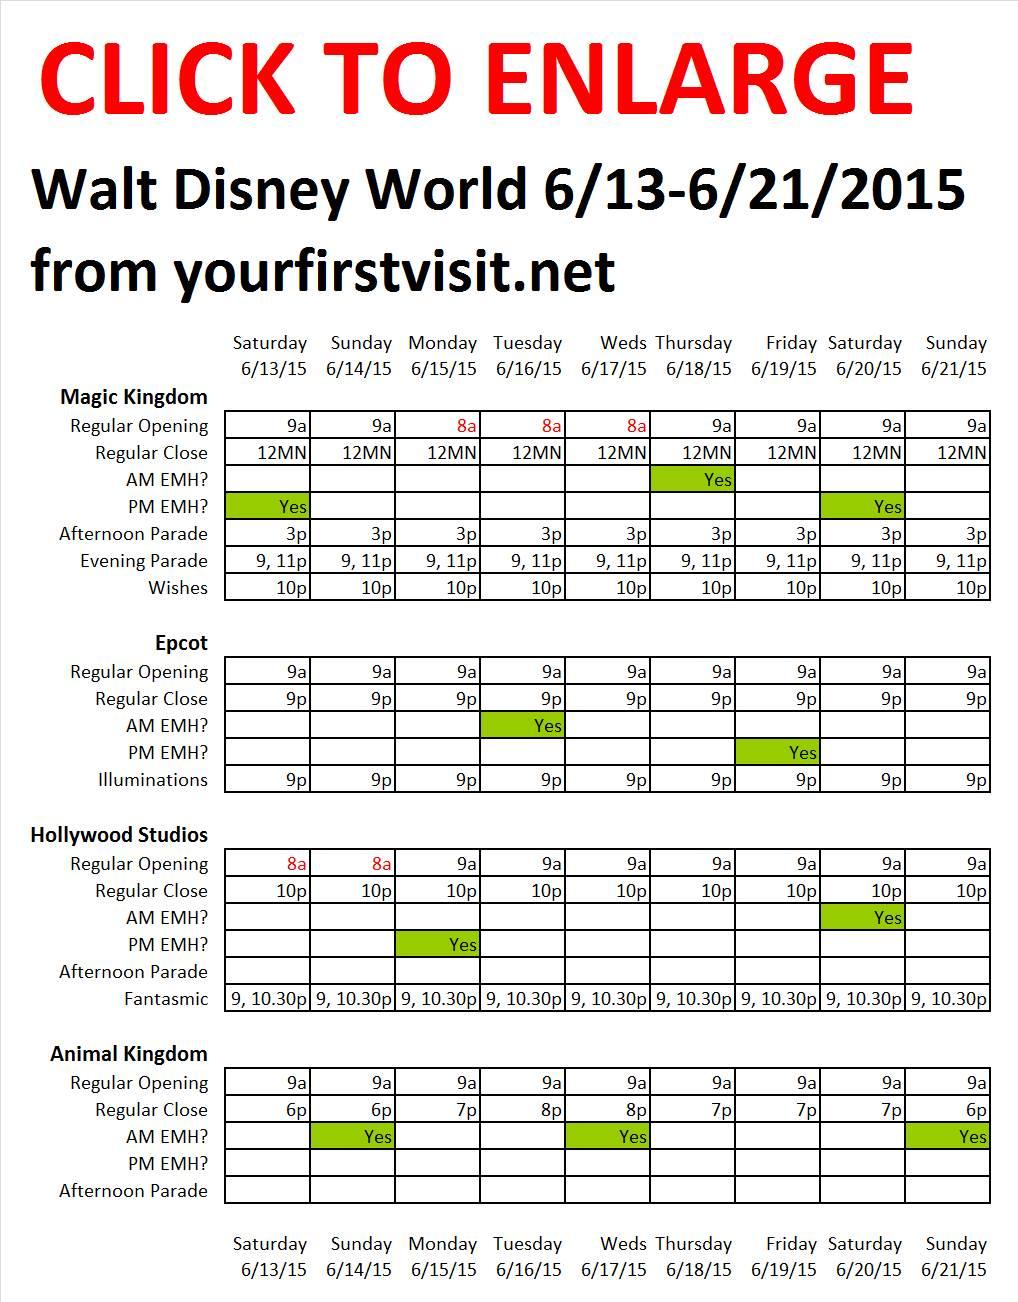 Disney World 6-13 to 6-21-2015 from yourfirstvisit.net